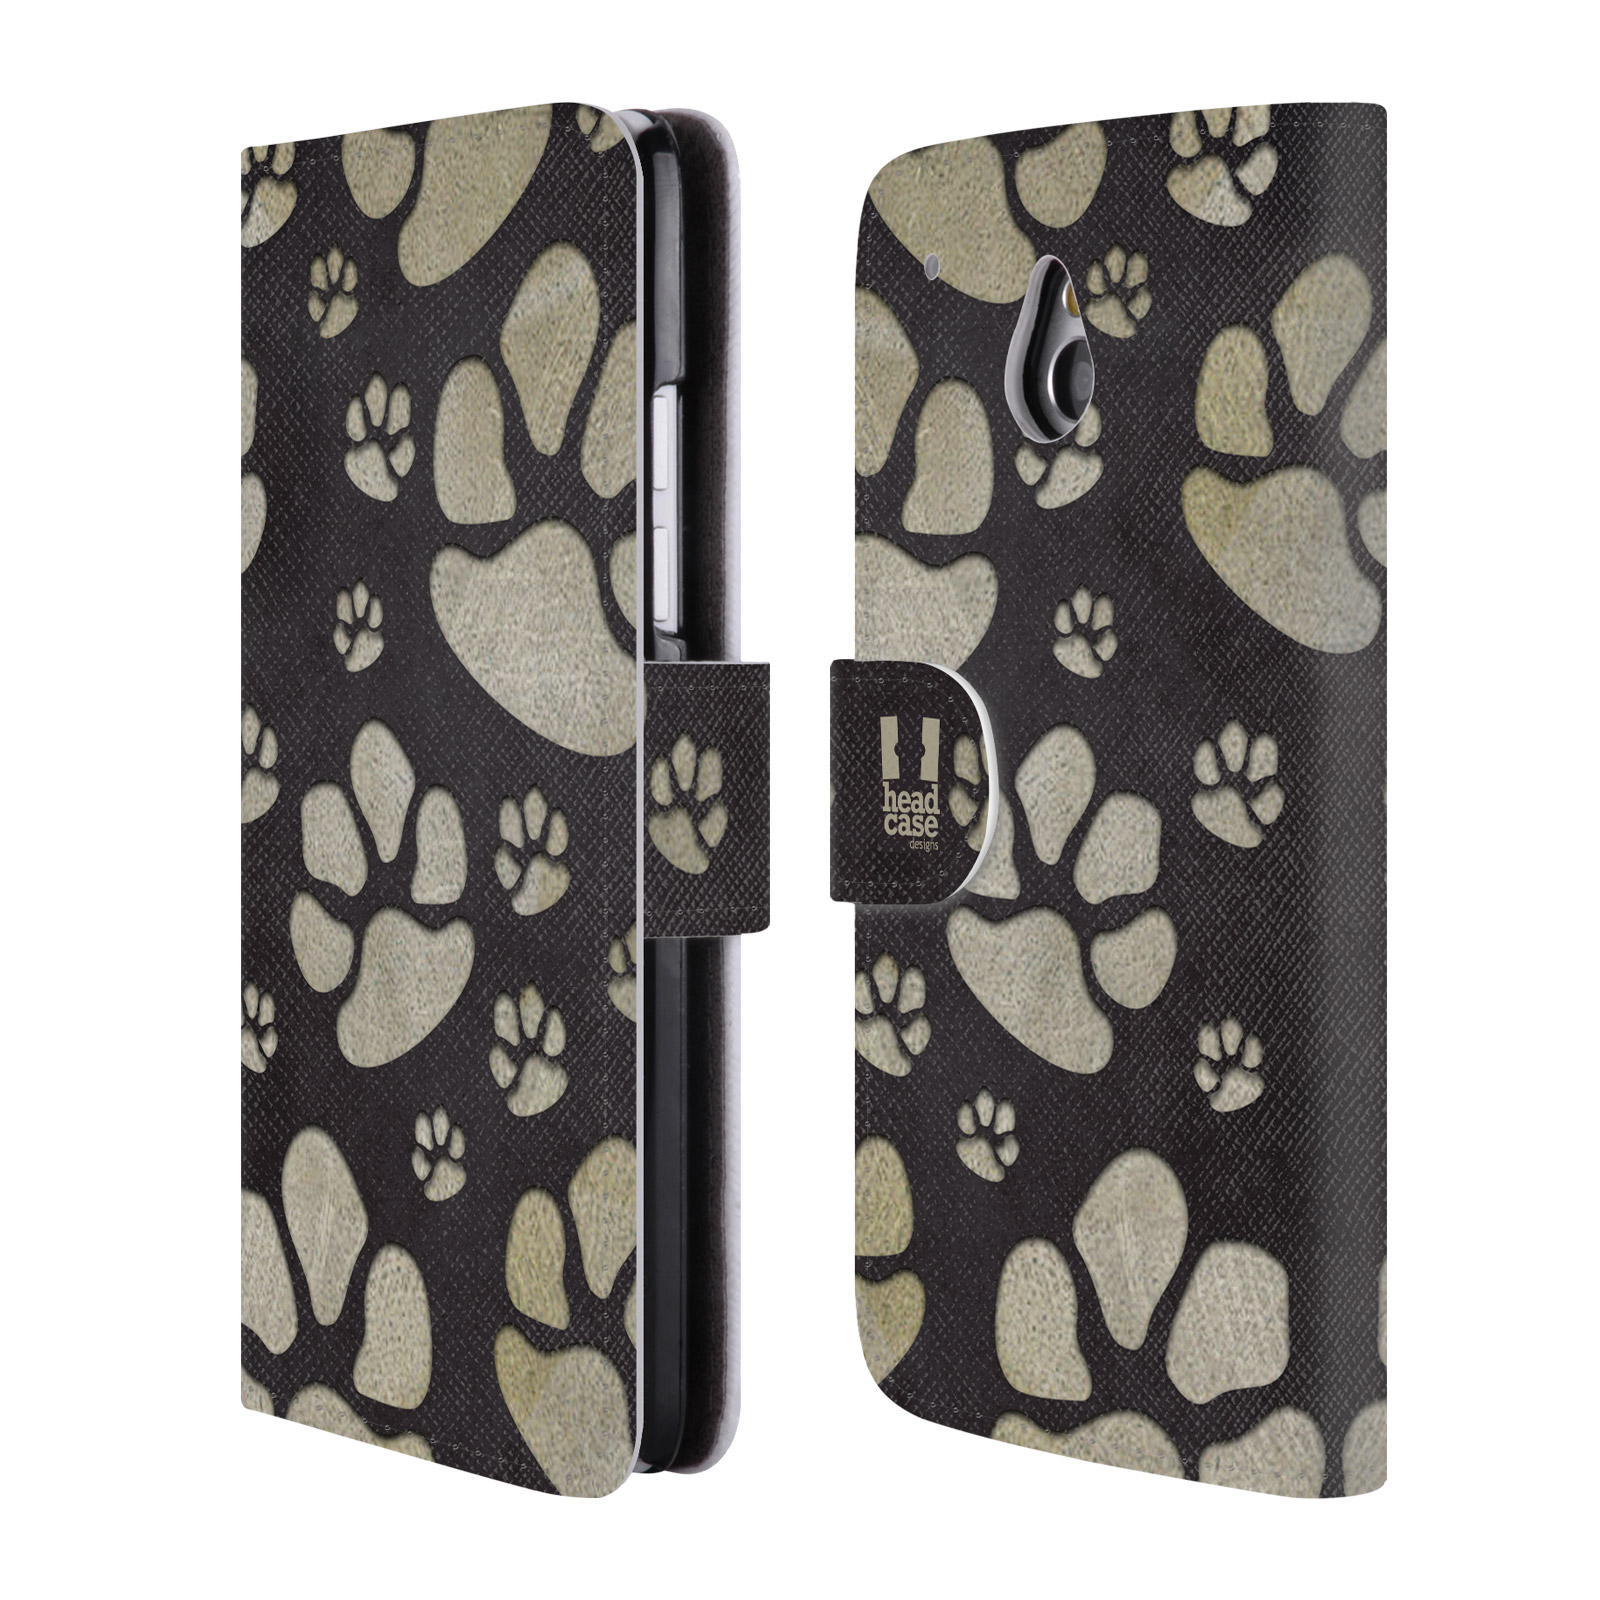 HEAD CASE Flipové pouzdro pro mobil HTC ONE MINI (M4) Pejsek ťapky velké tmavá